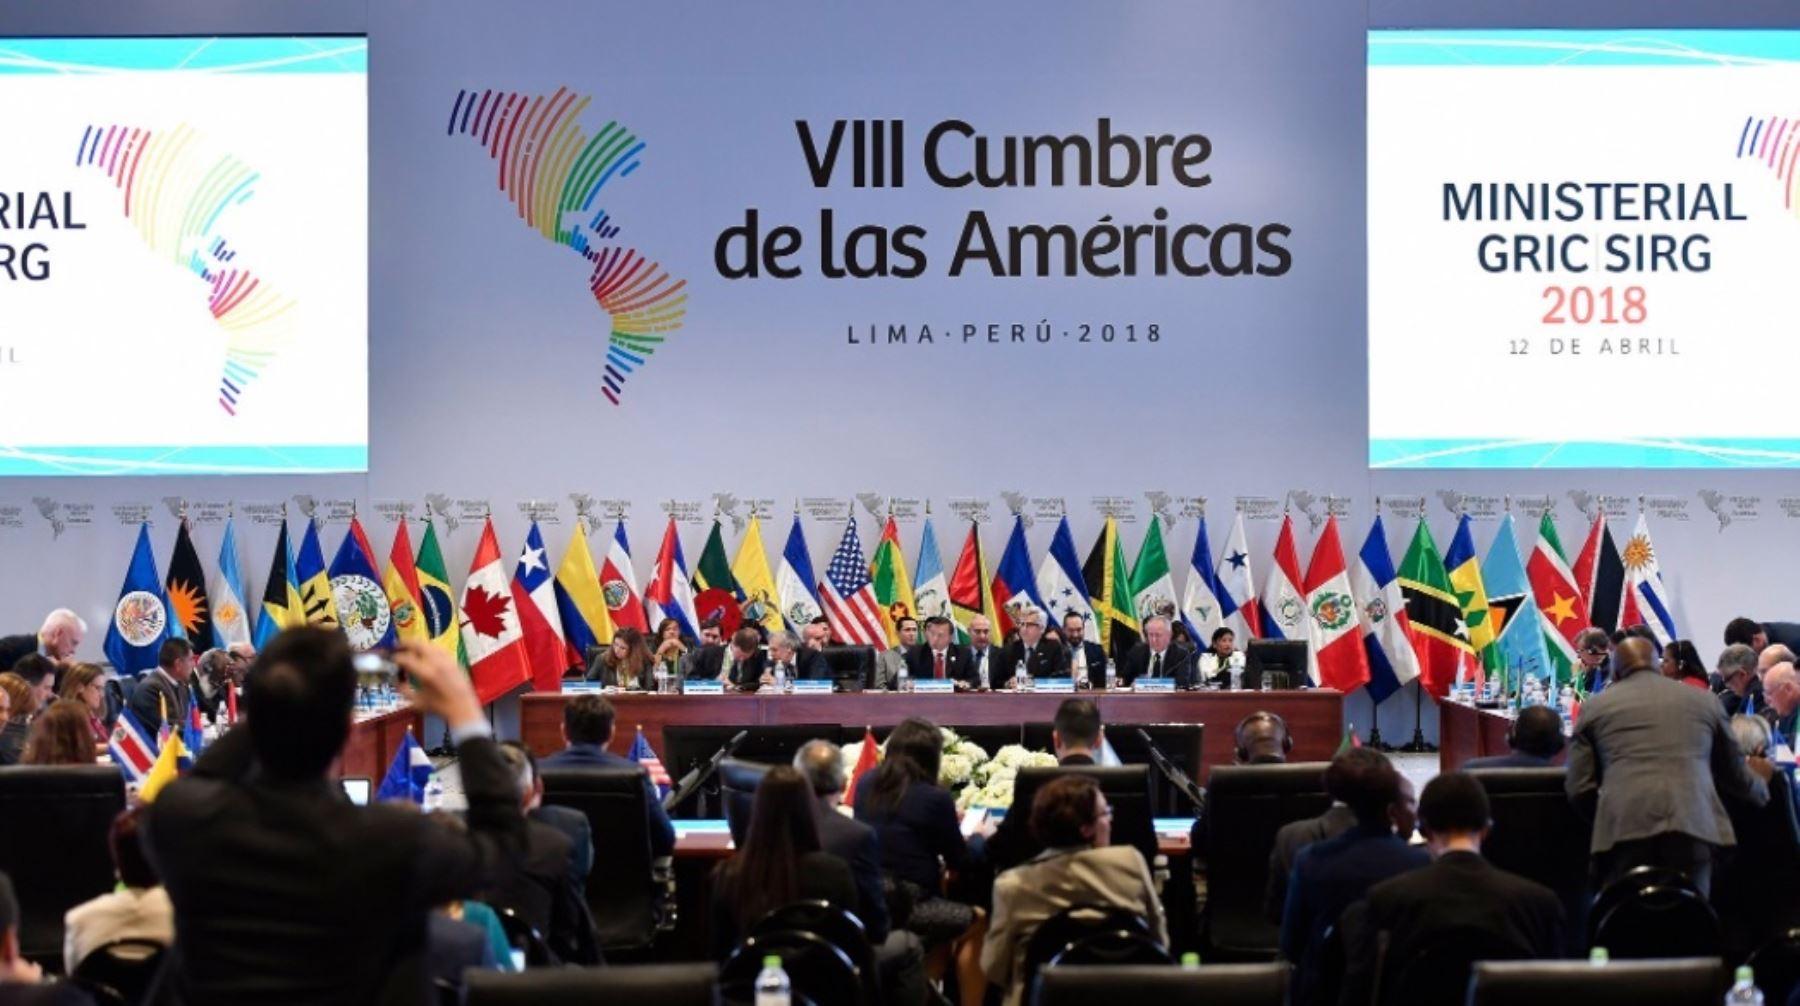 Cancilleres culminan negociación de compromiso anticorrupción de Cumbre de las Américas.